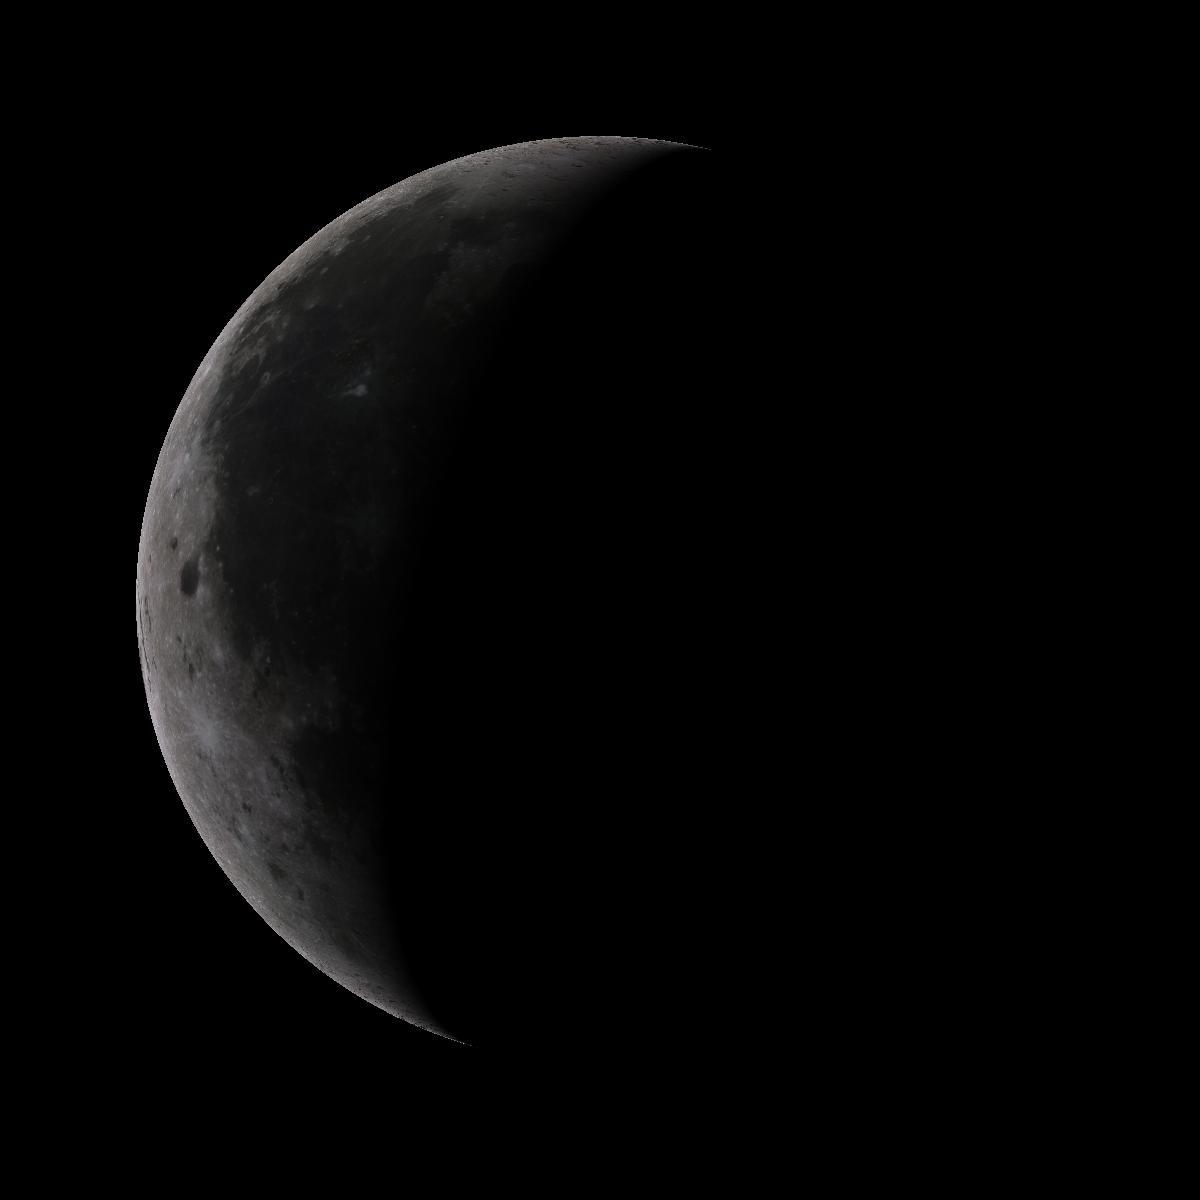 Lune du 27 juillet 2019